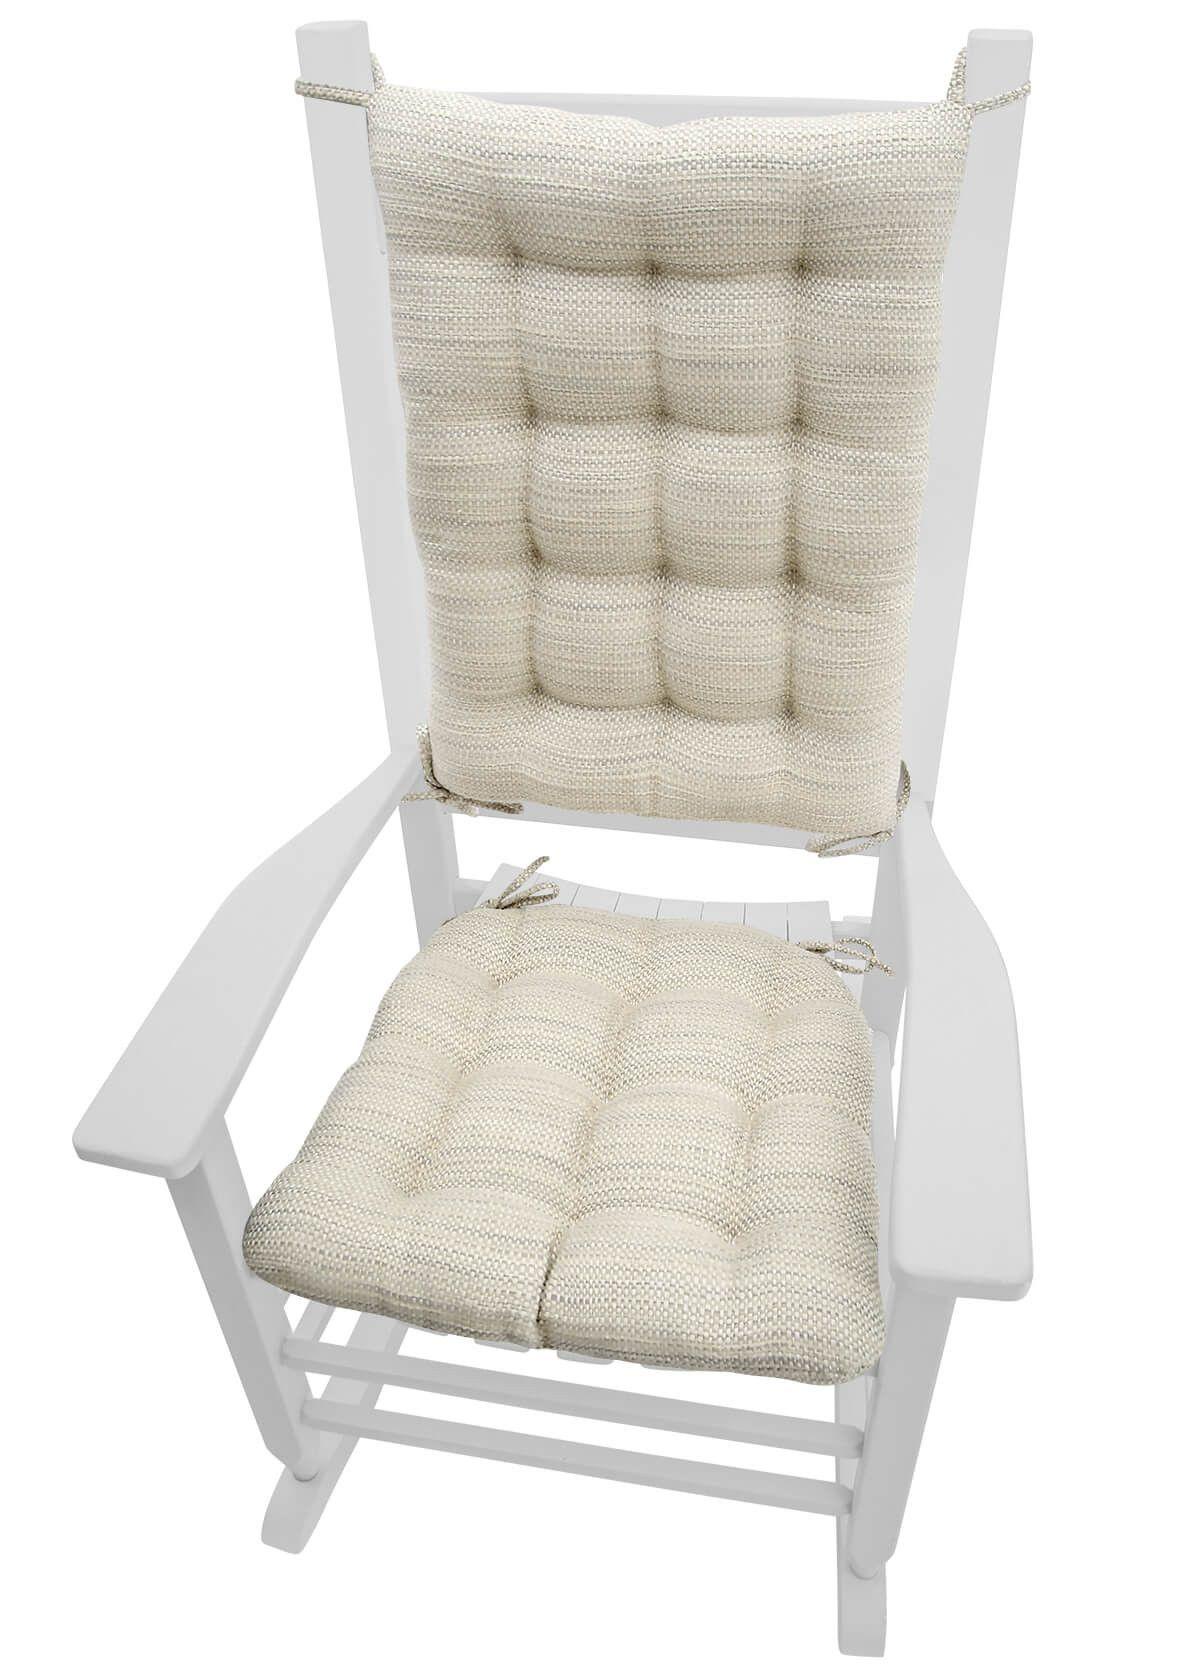 Superieur Brisbane Mist Grey Rocking Chair Cushions   Latex Foam Fill   Reversible